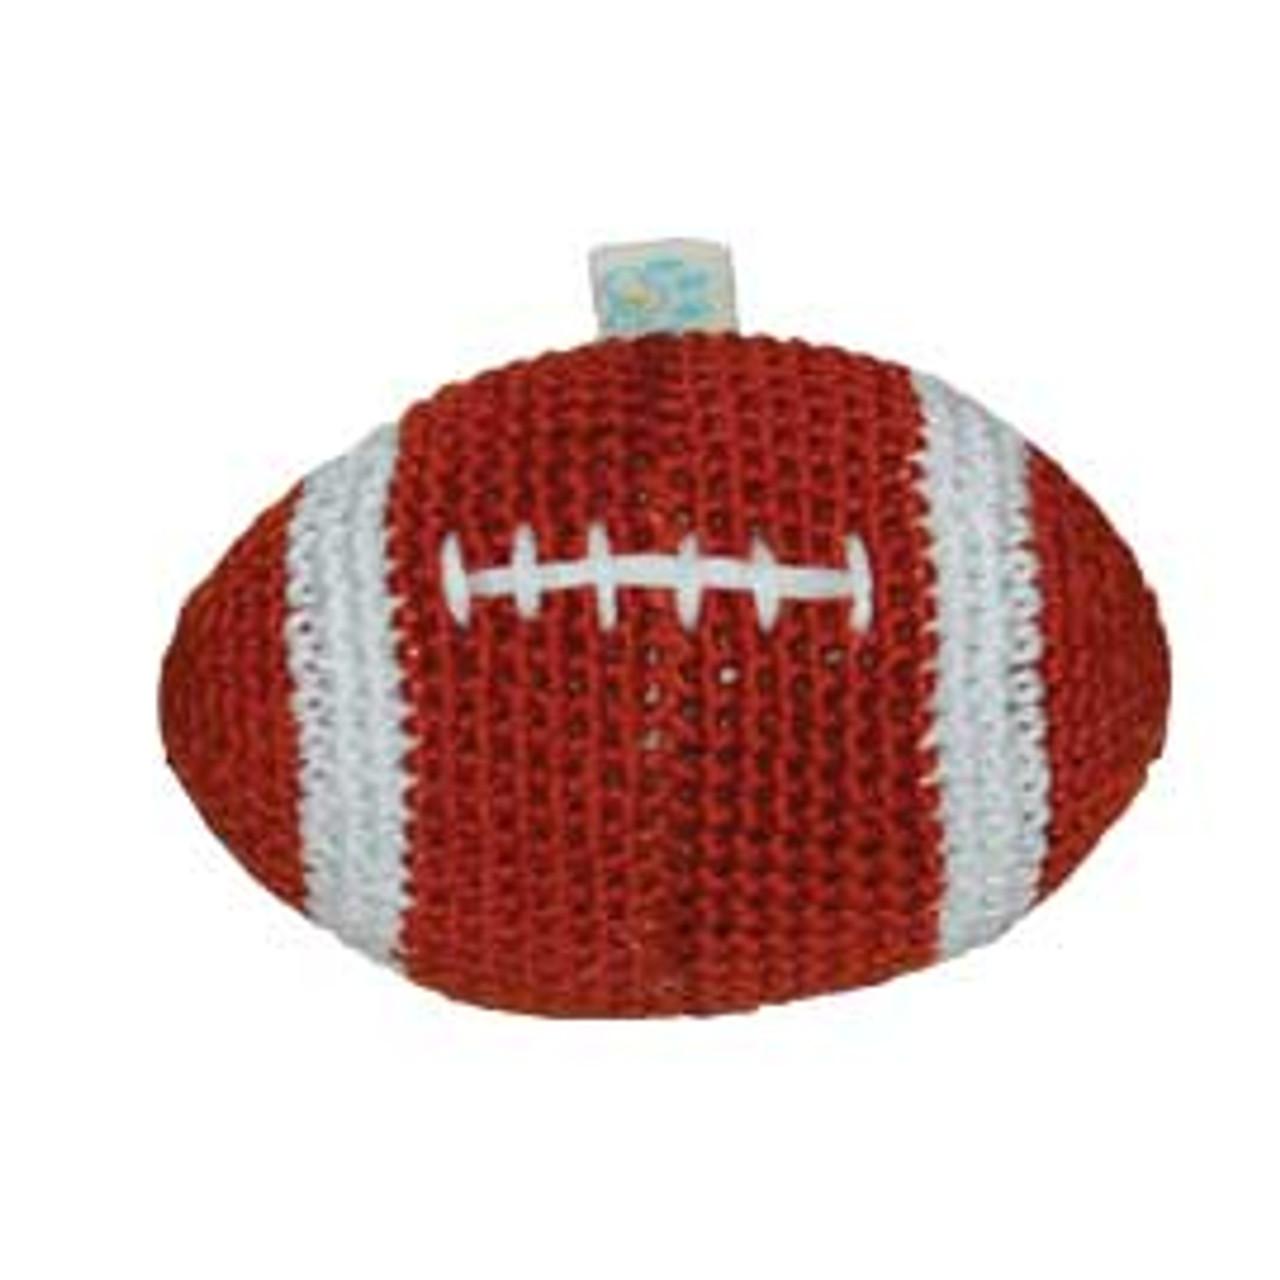 Football Crocheted Dog Toy